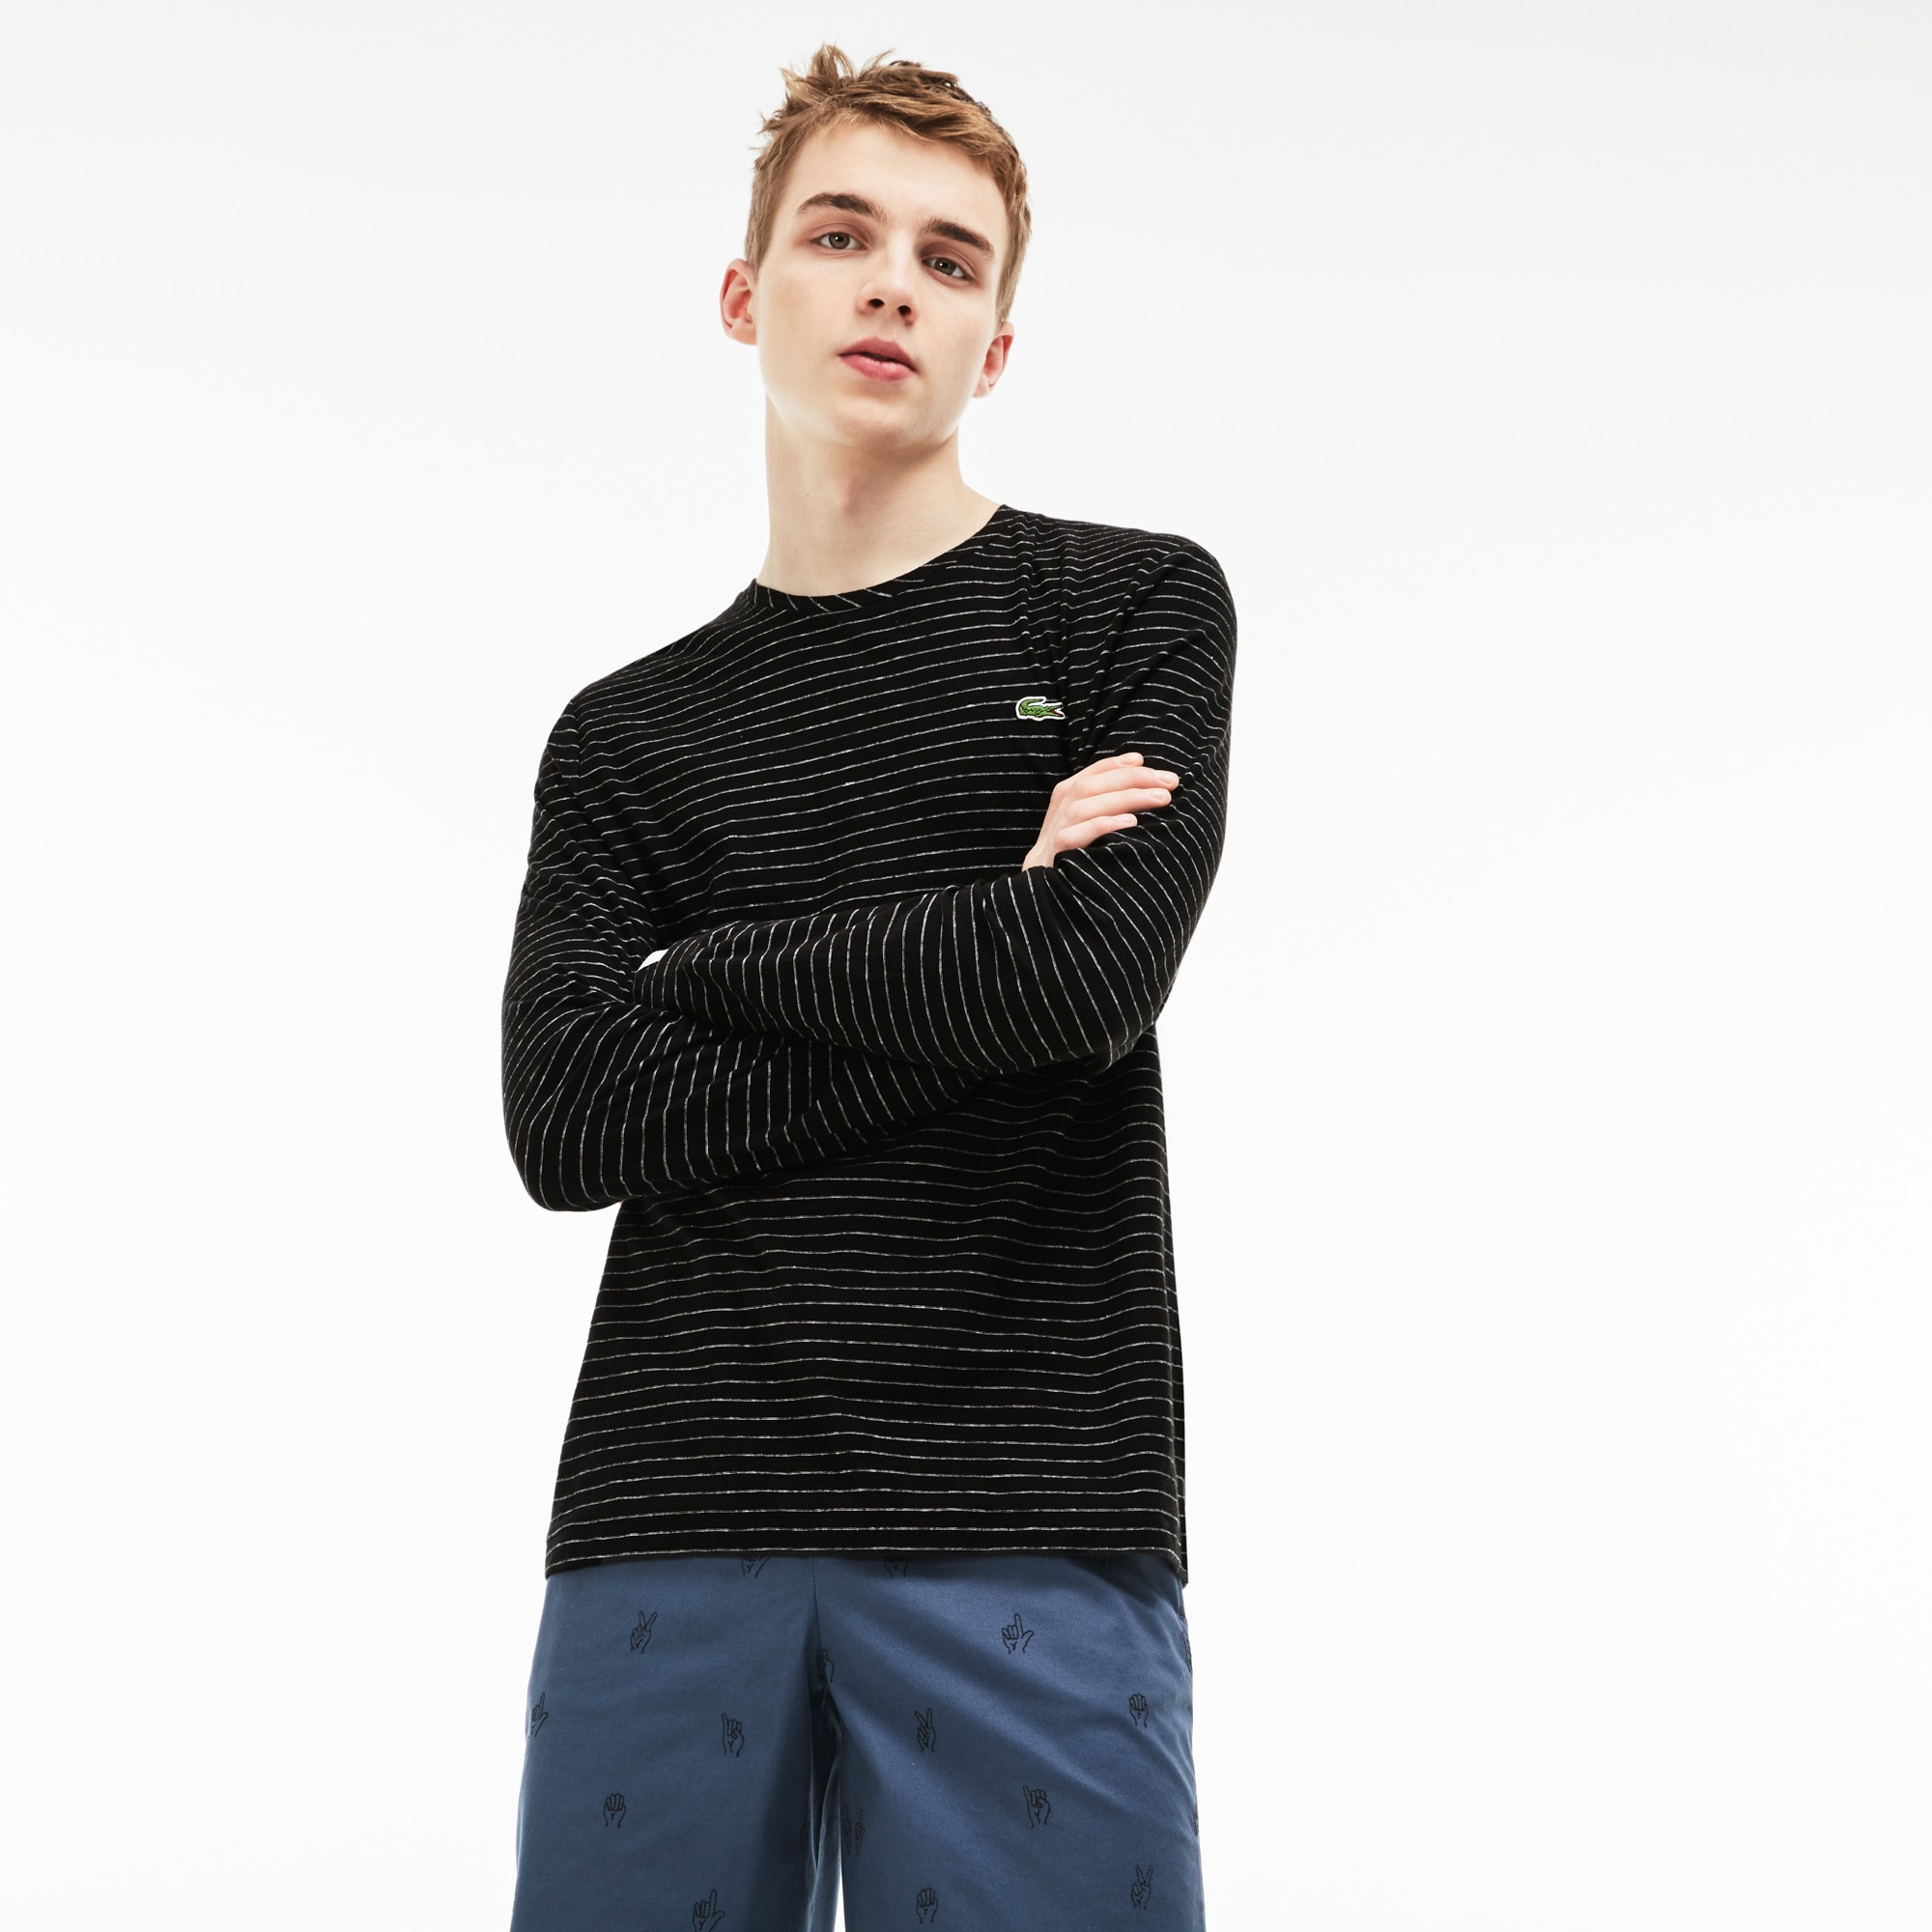 98de3cafb54bfb Men s Lacoste LIVE Striped Cotton And Linen Jersey T-shirt